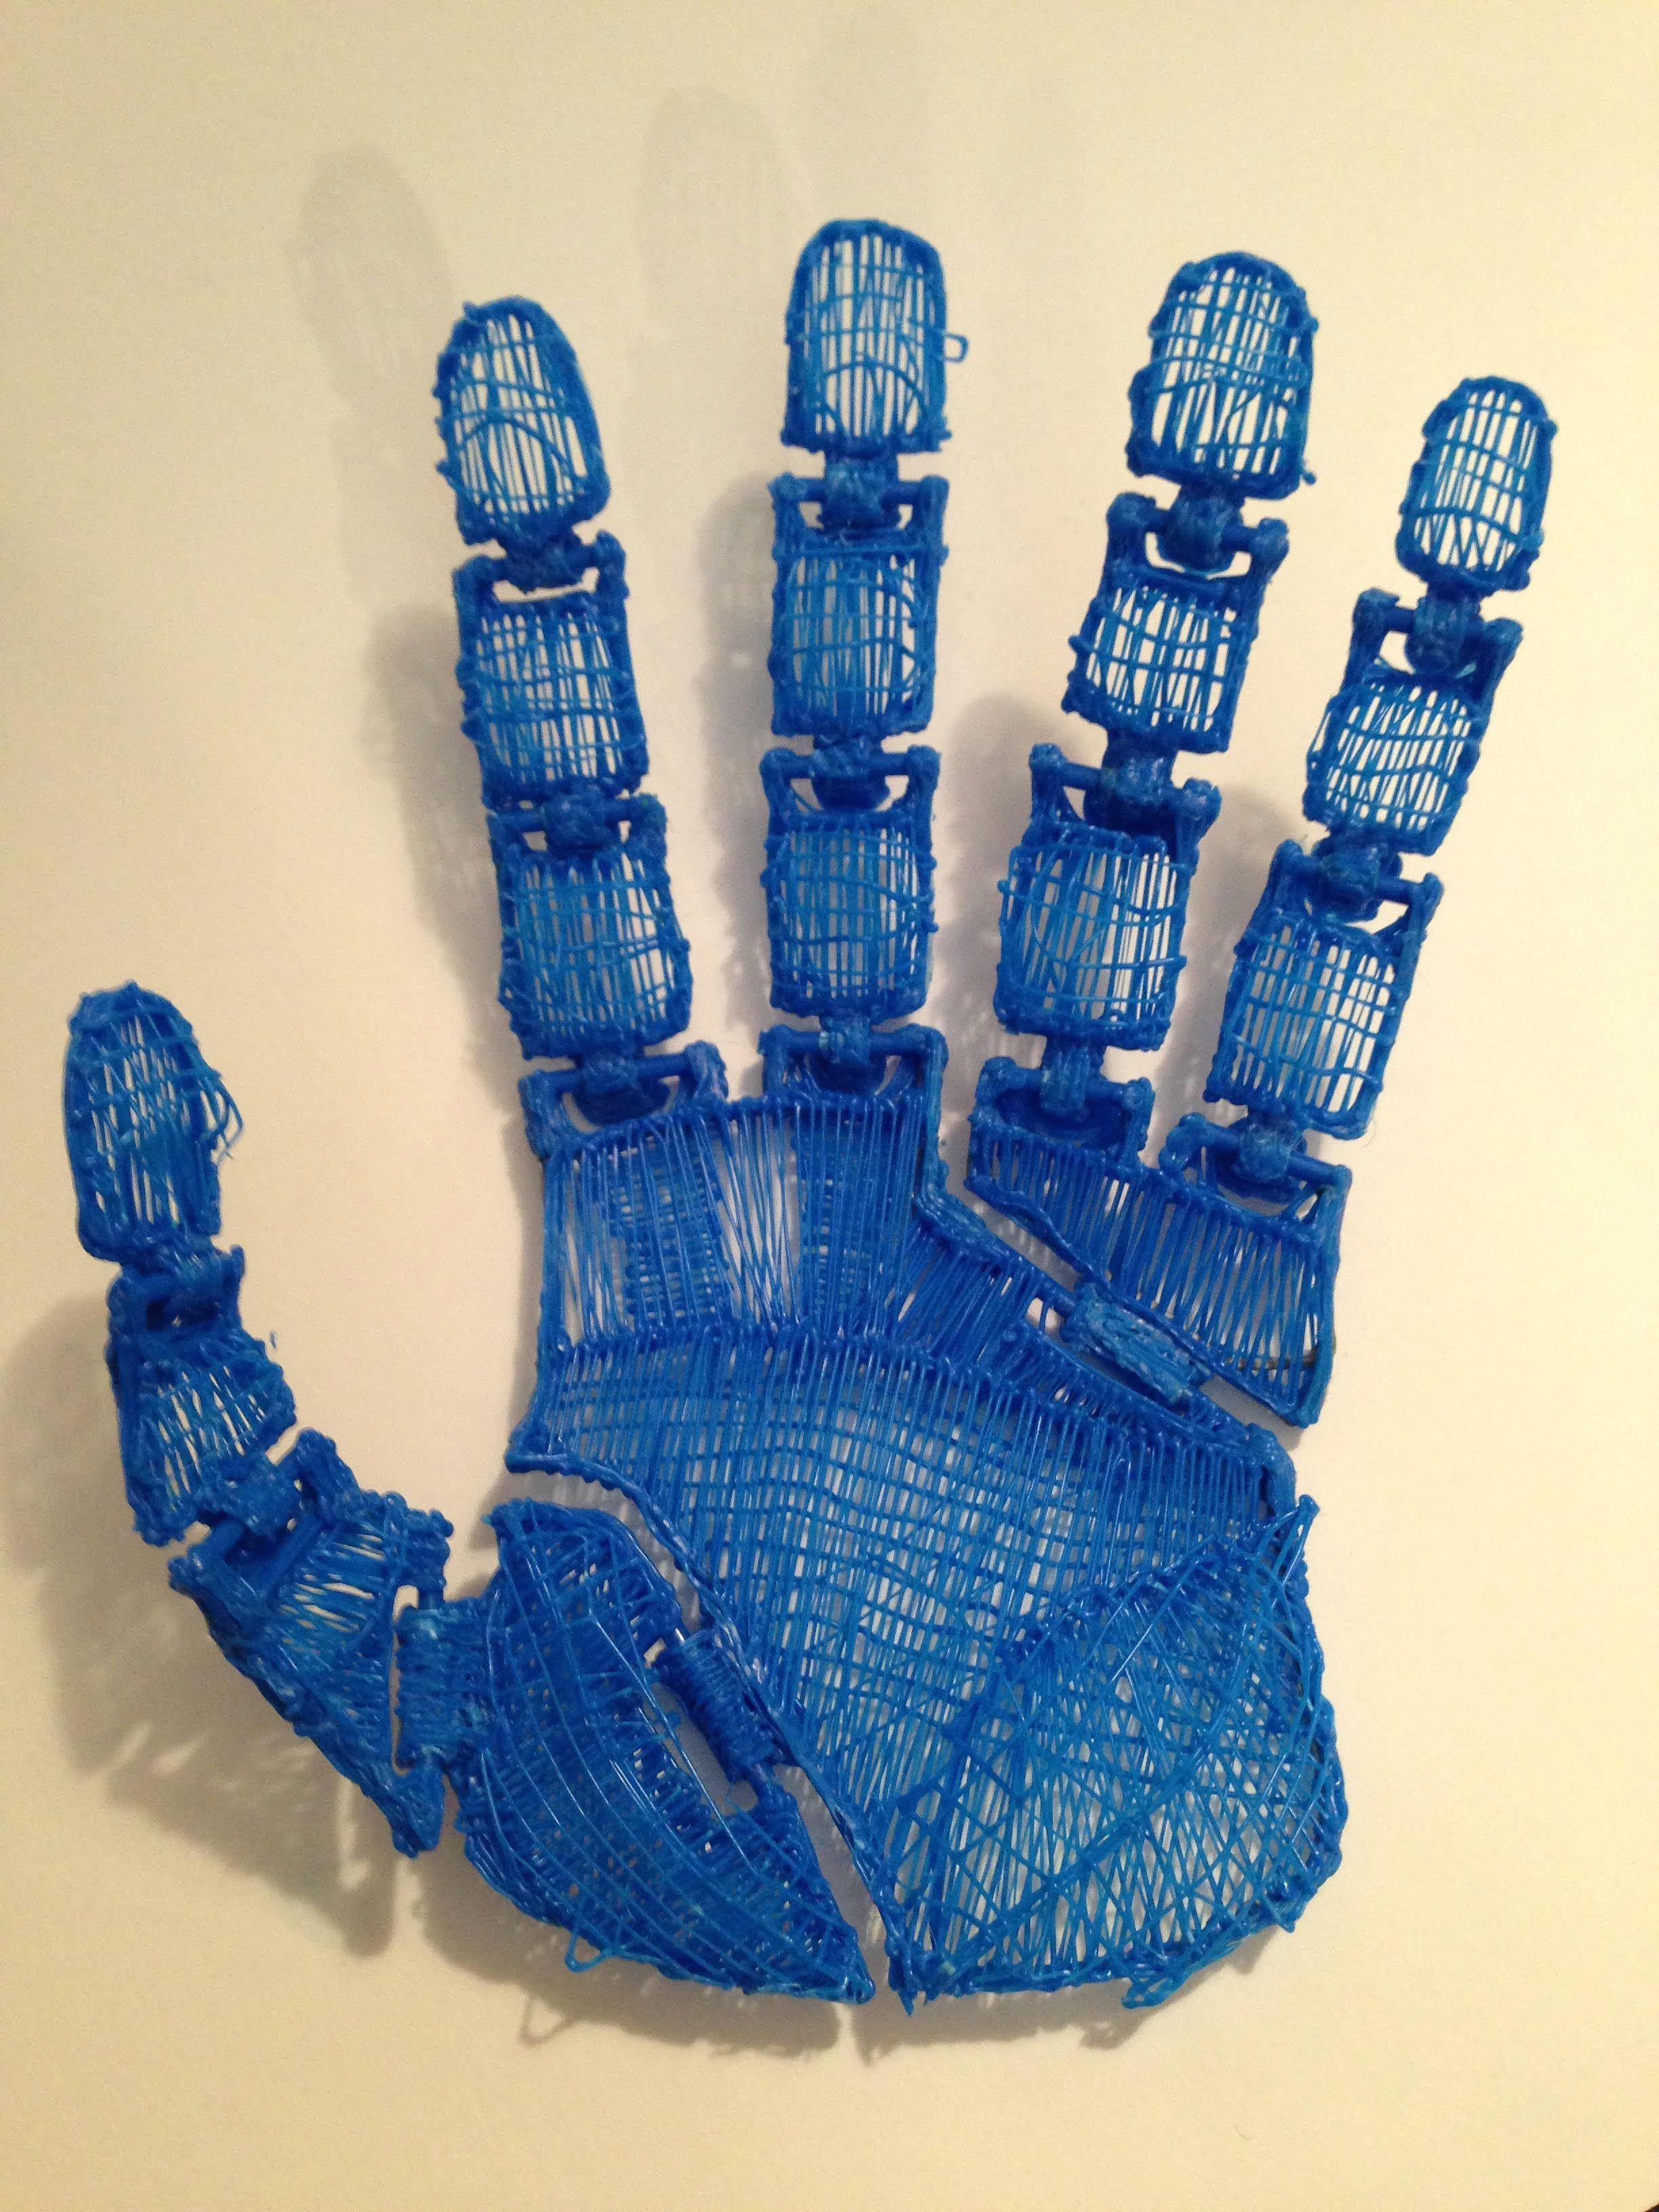 3doodled hand with joints pen design pen art 3d drawing pen 3d drawings